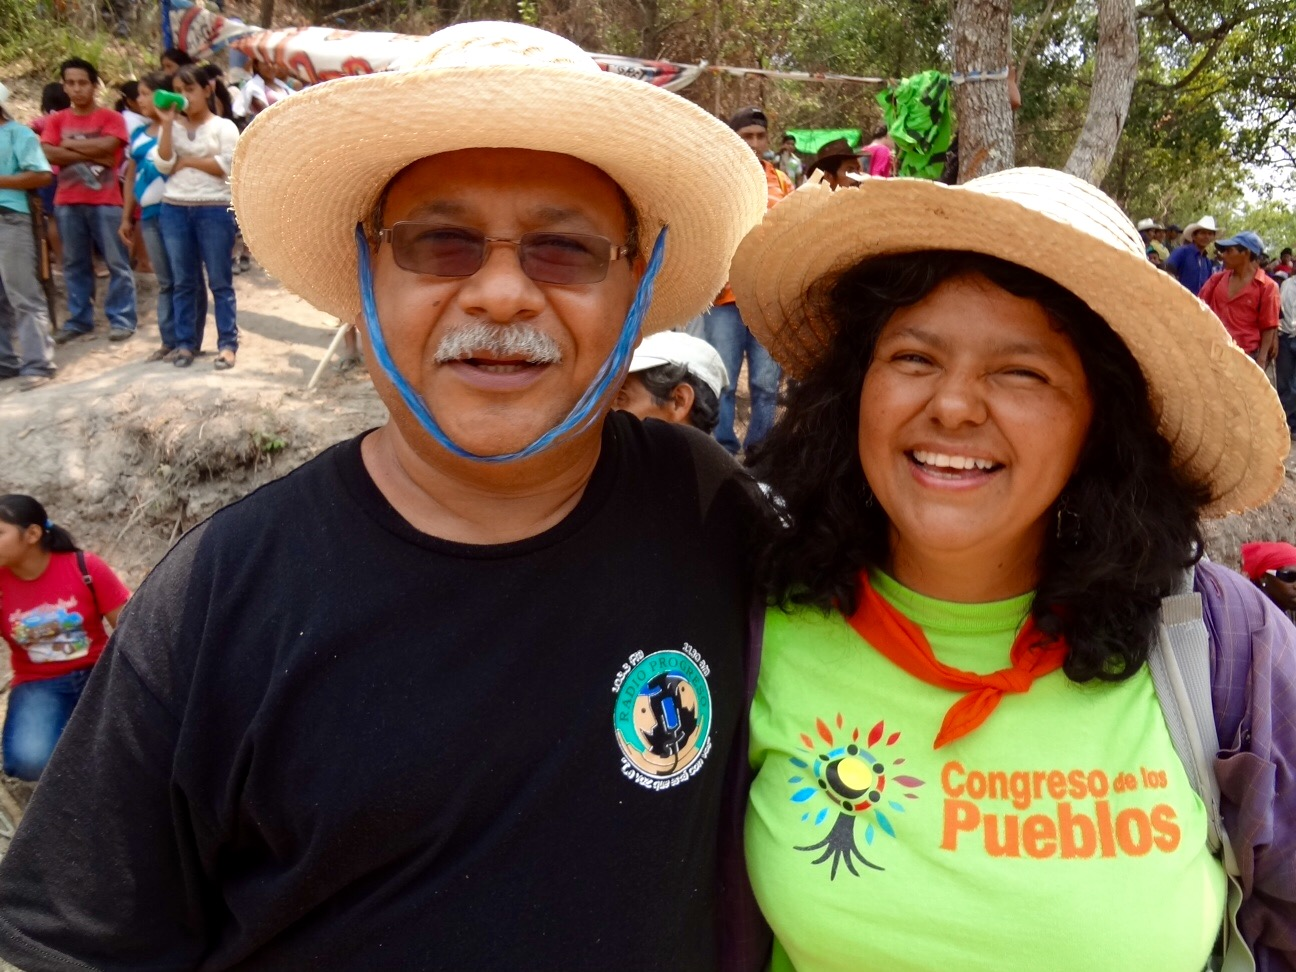 Stop the murders, bring justice to Honduras.